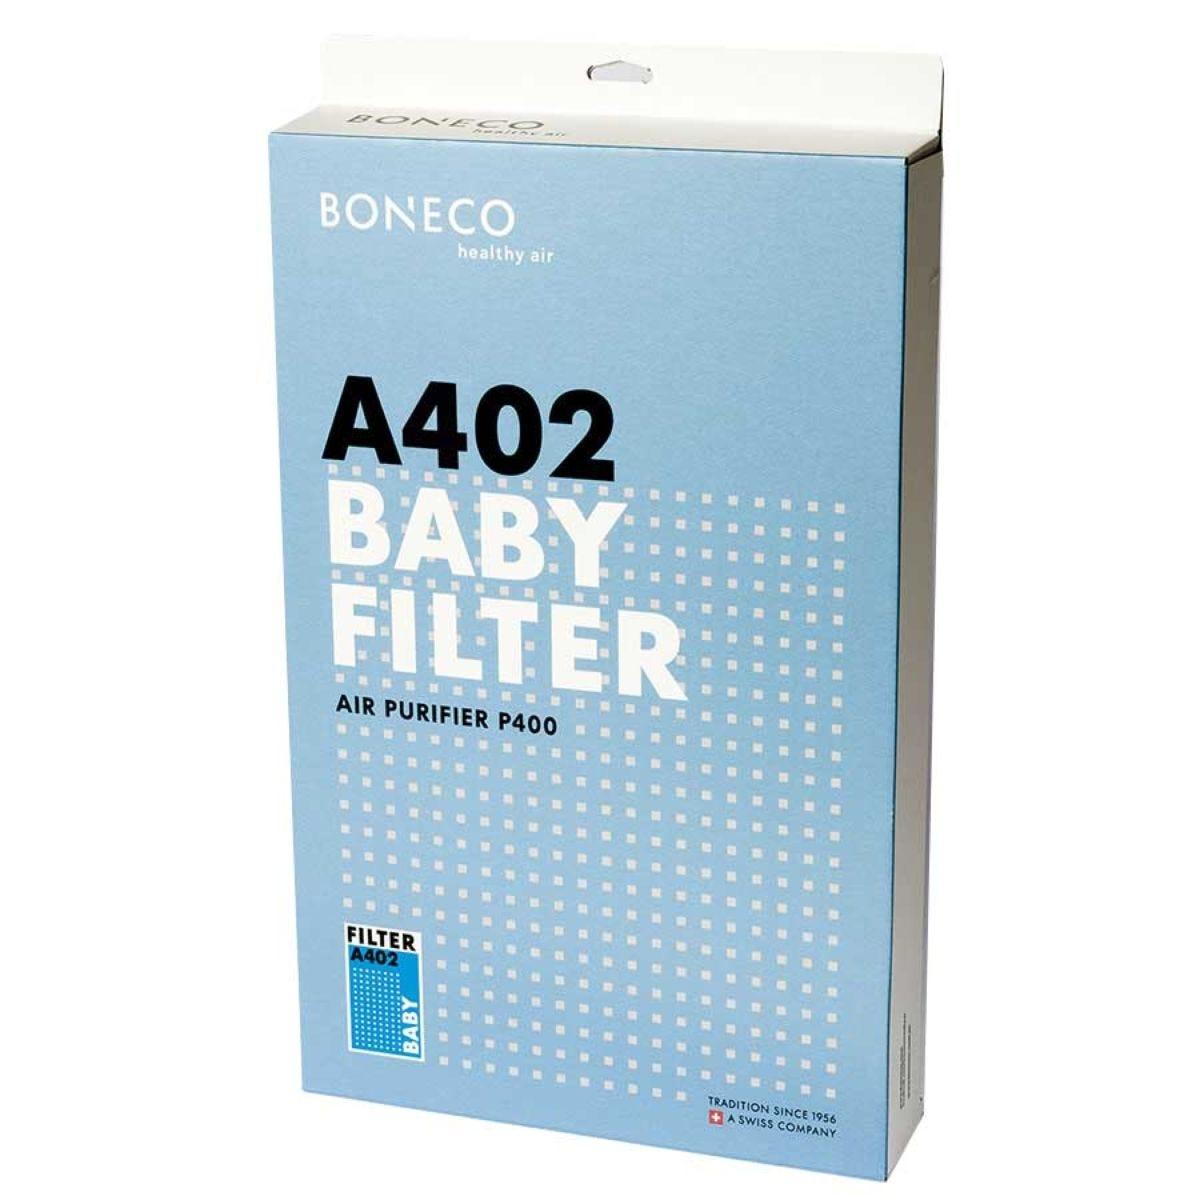 Boneco P400 Baby Filter